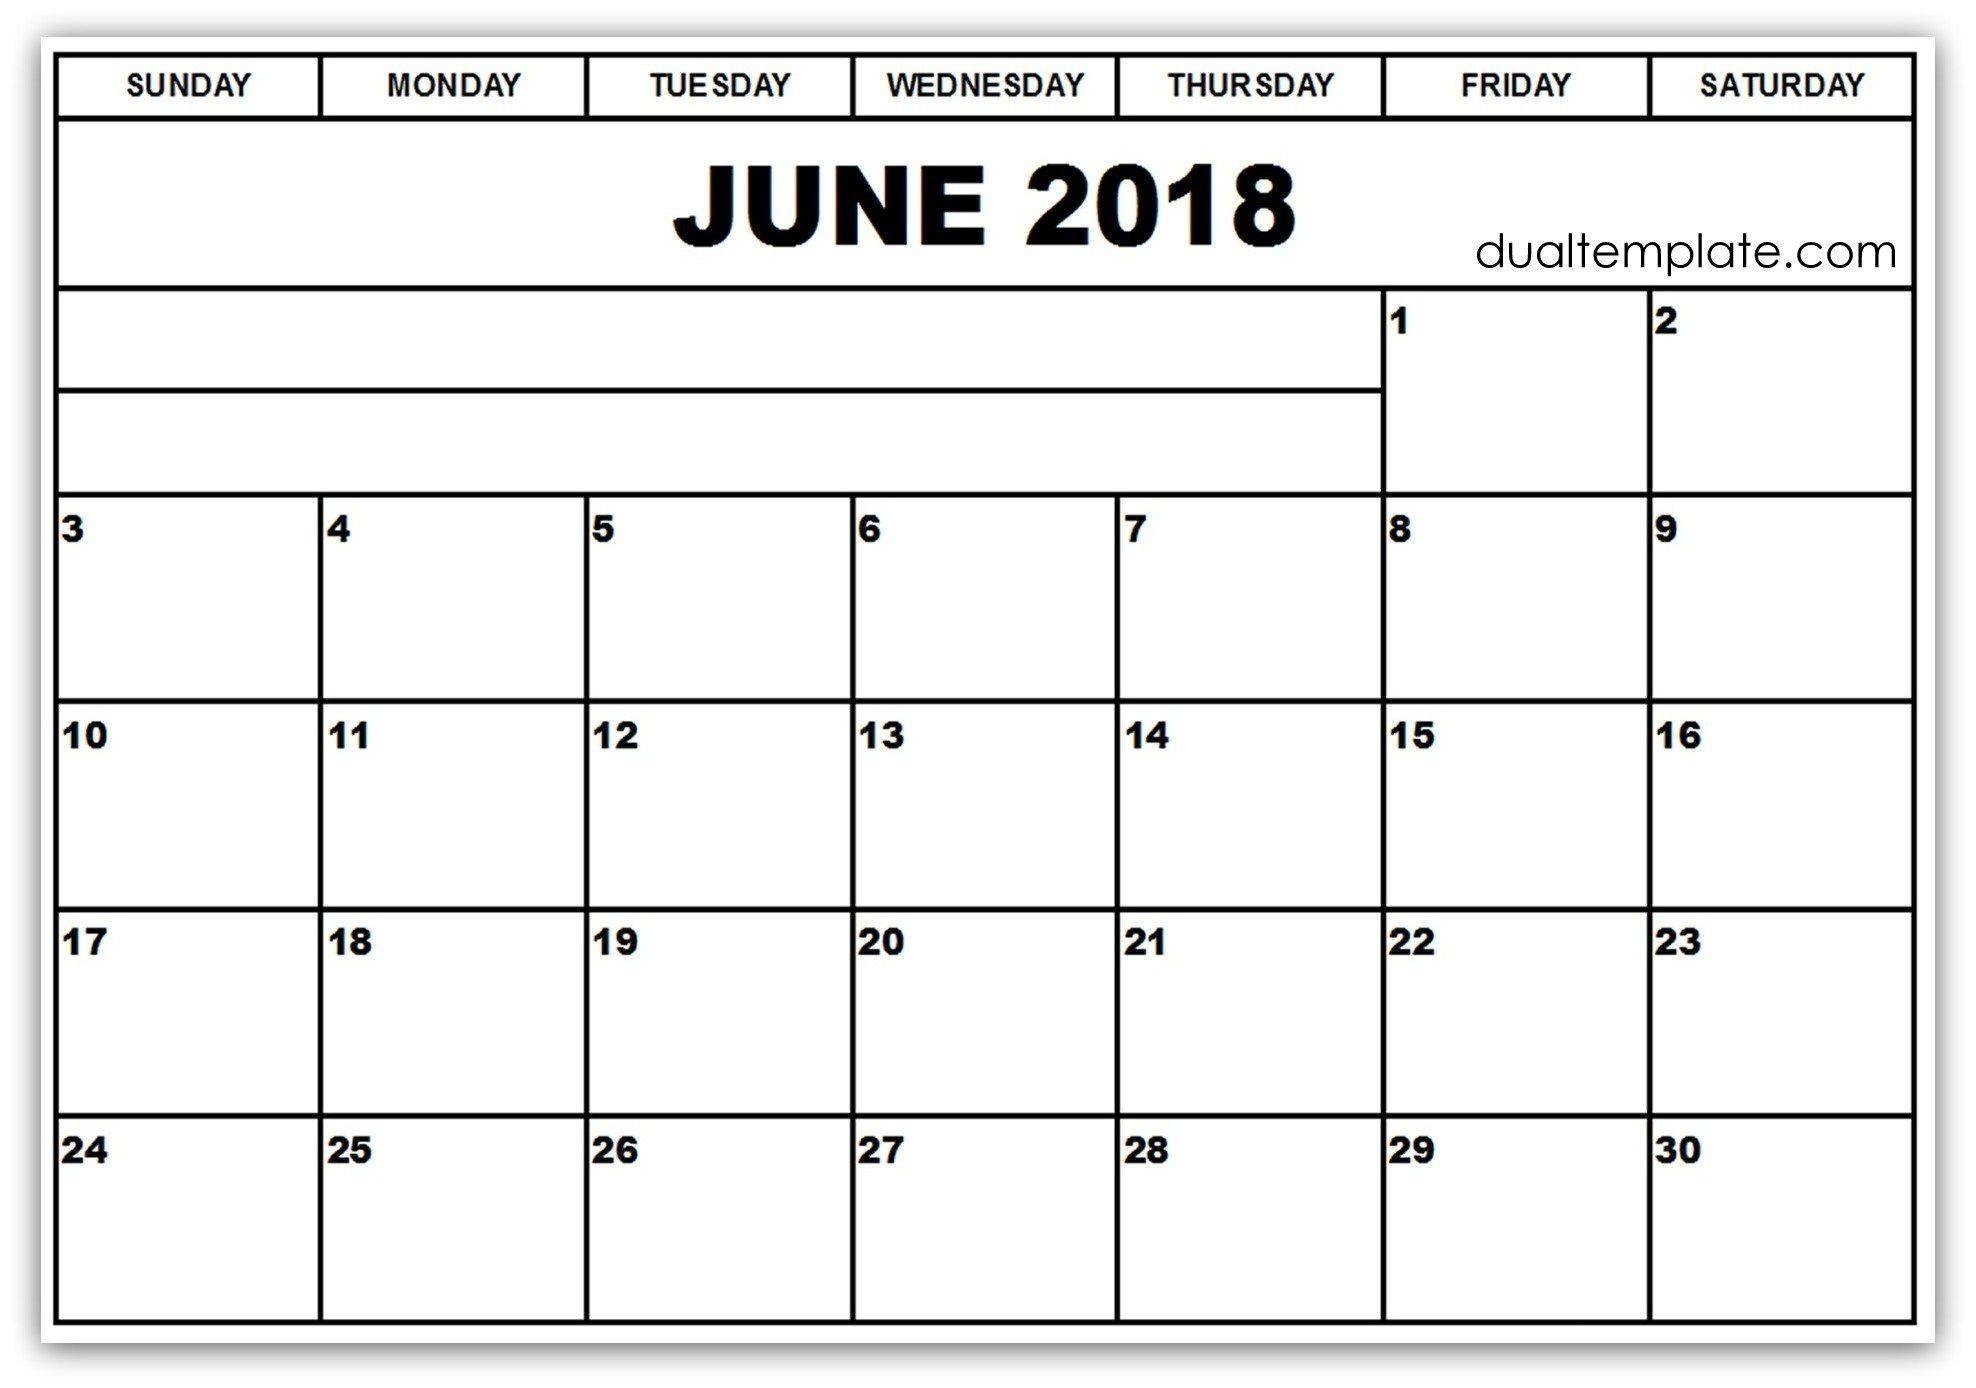 julian date calendar 2019 printable julian date calendar 2019